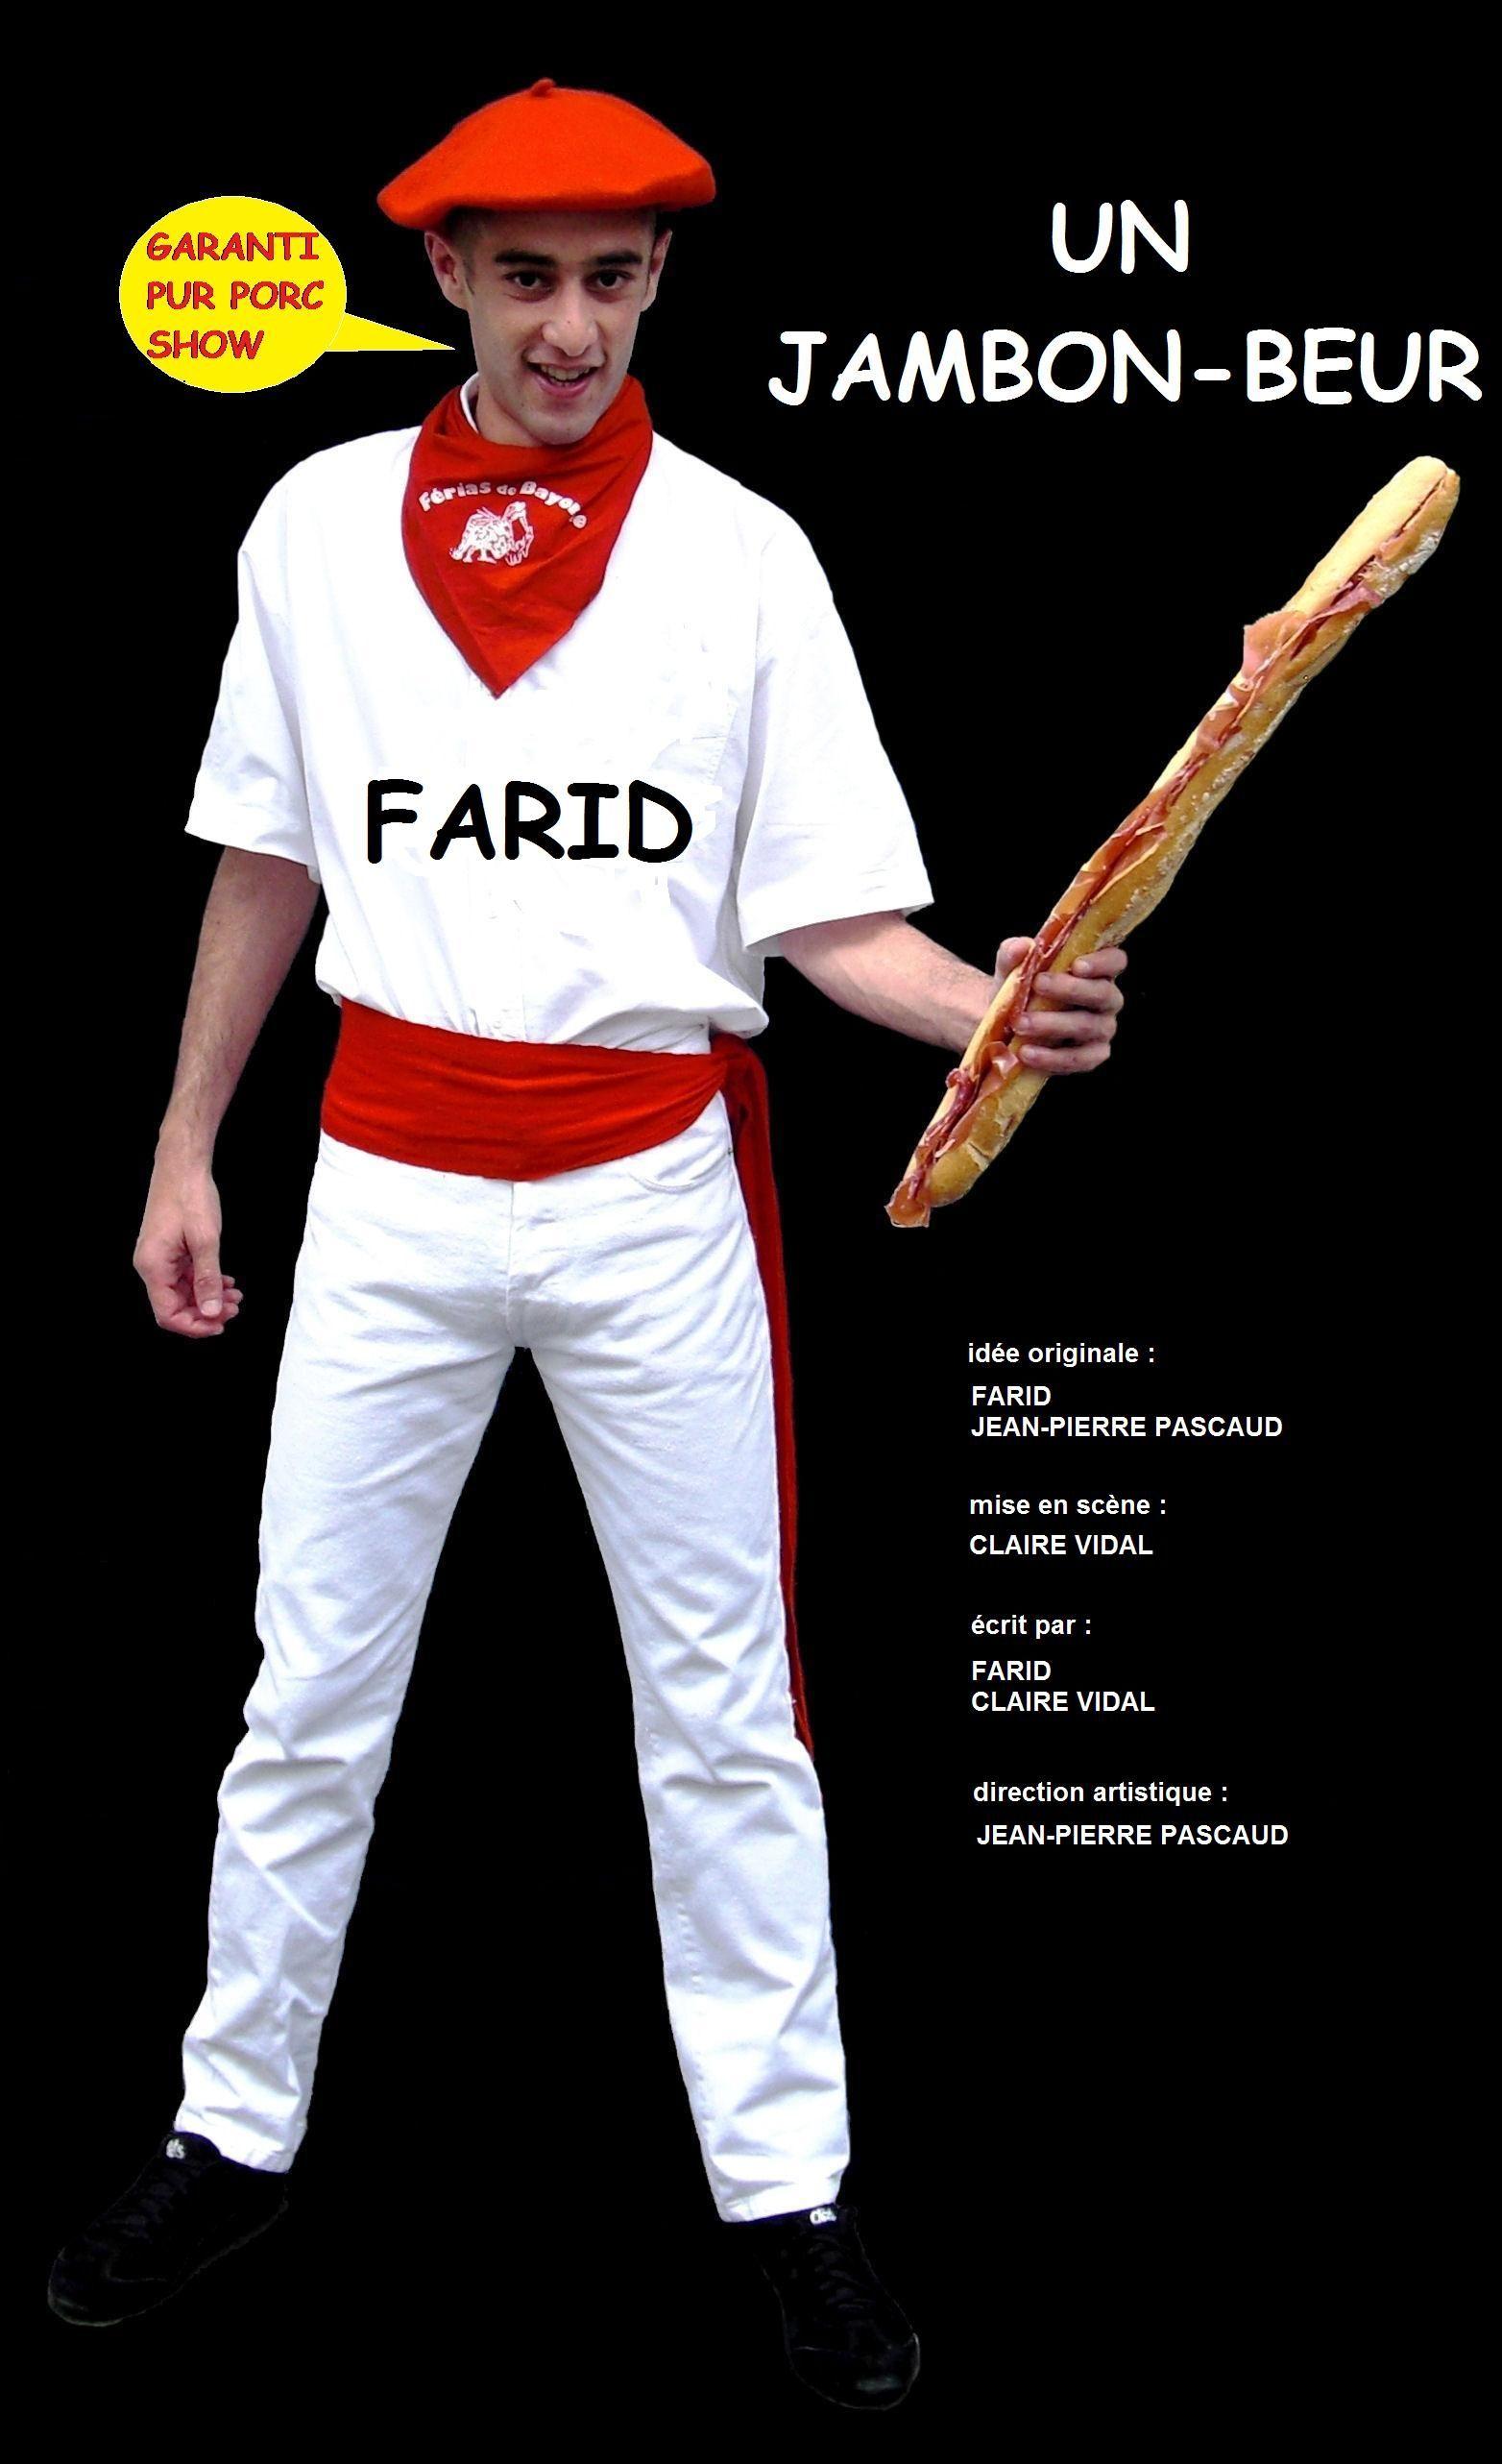 concert Farid (un Jambon Beur)